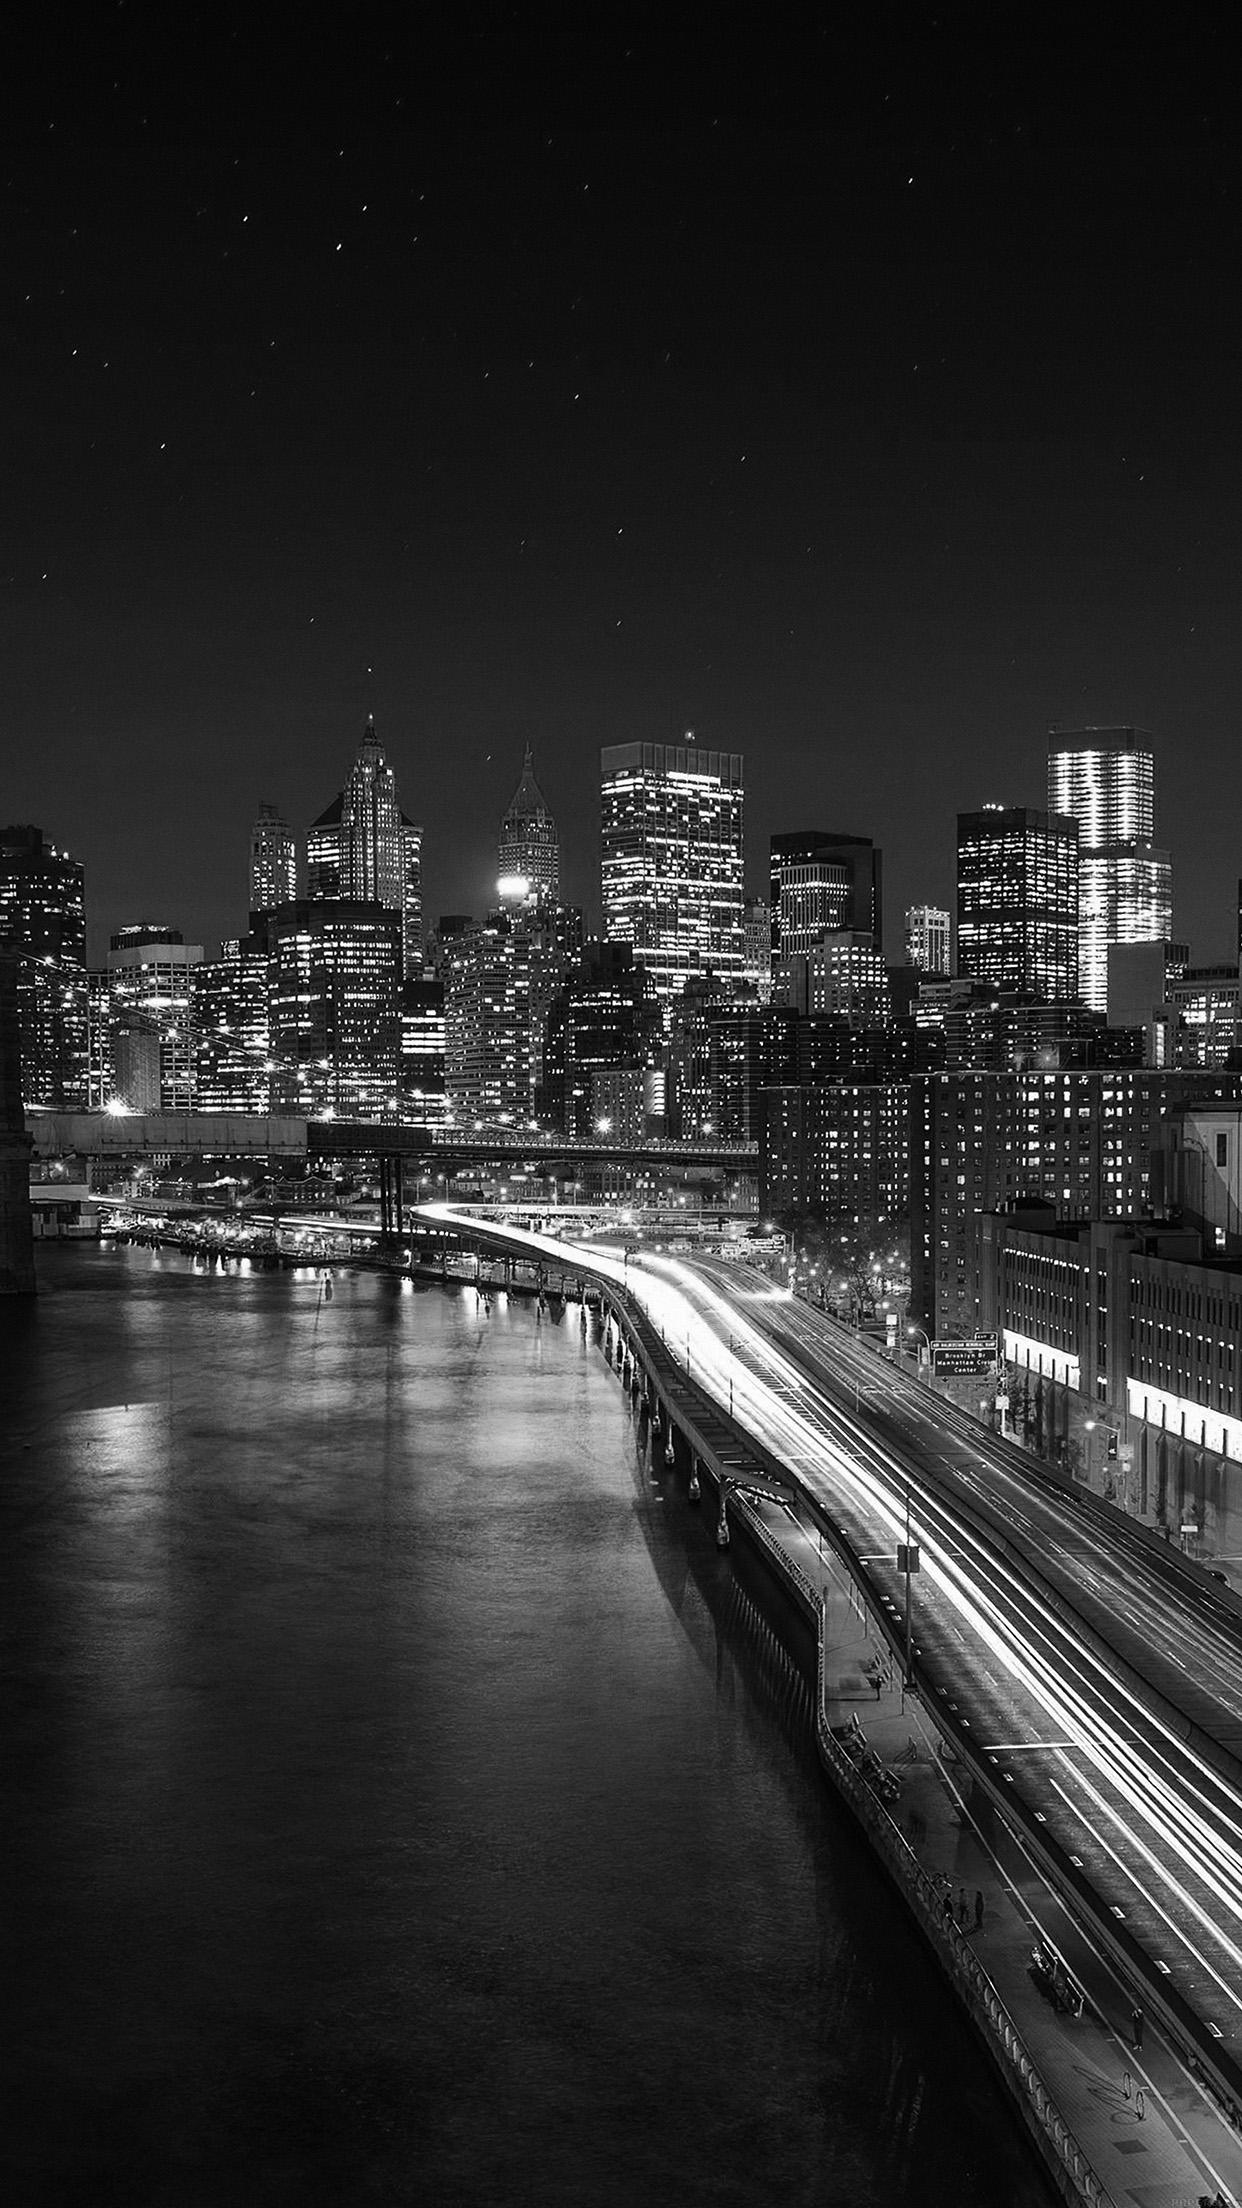 Iphone7paperscom Iphone7 Wallpaper Mk04 Night City View